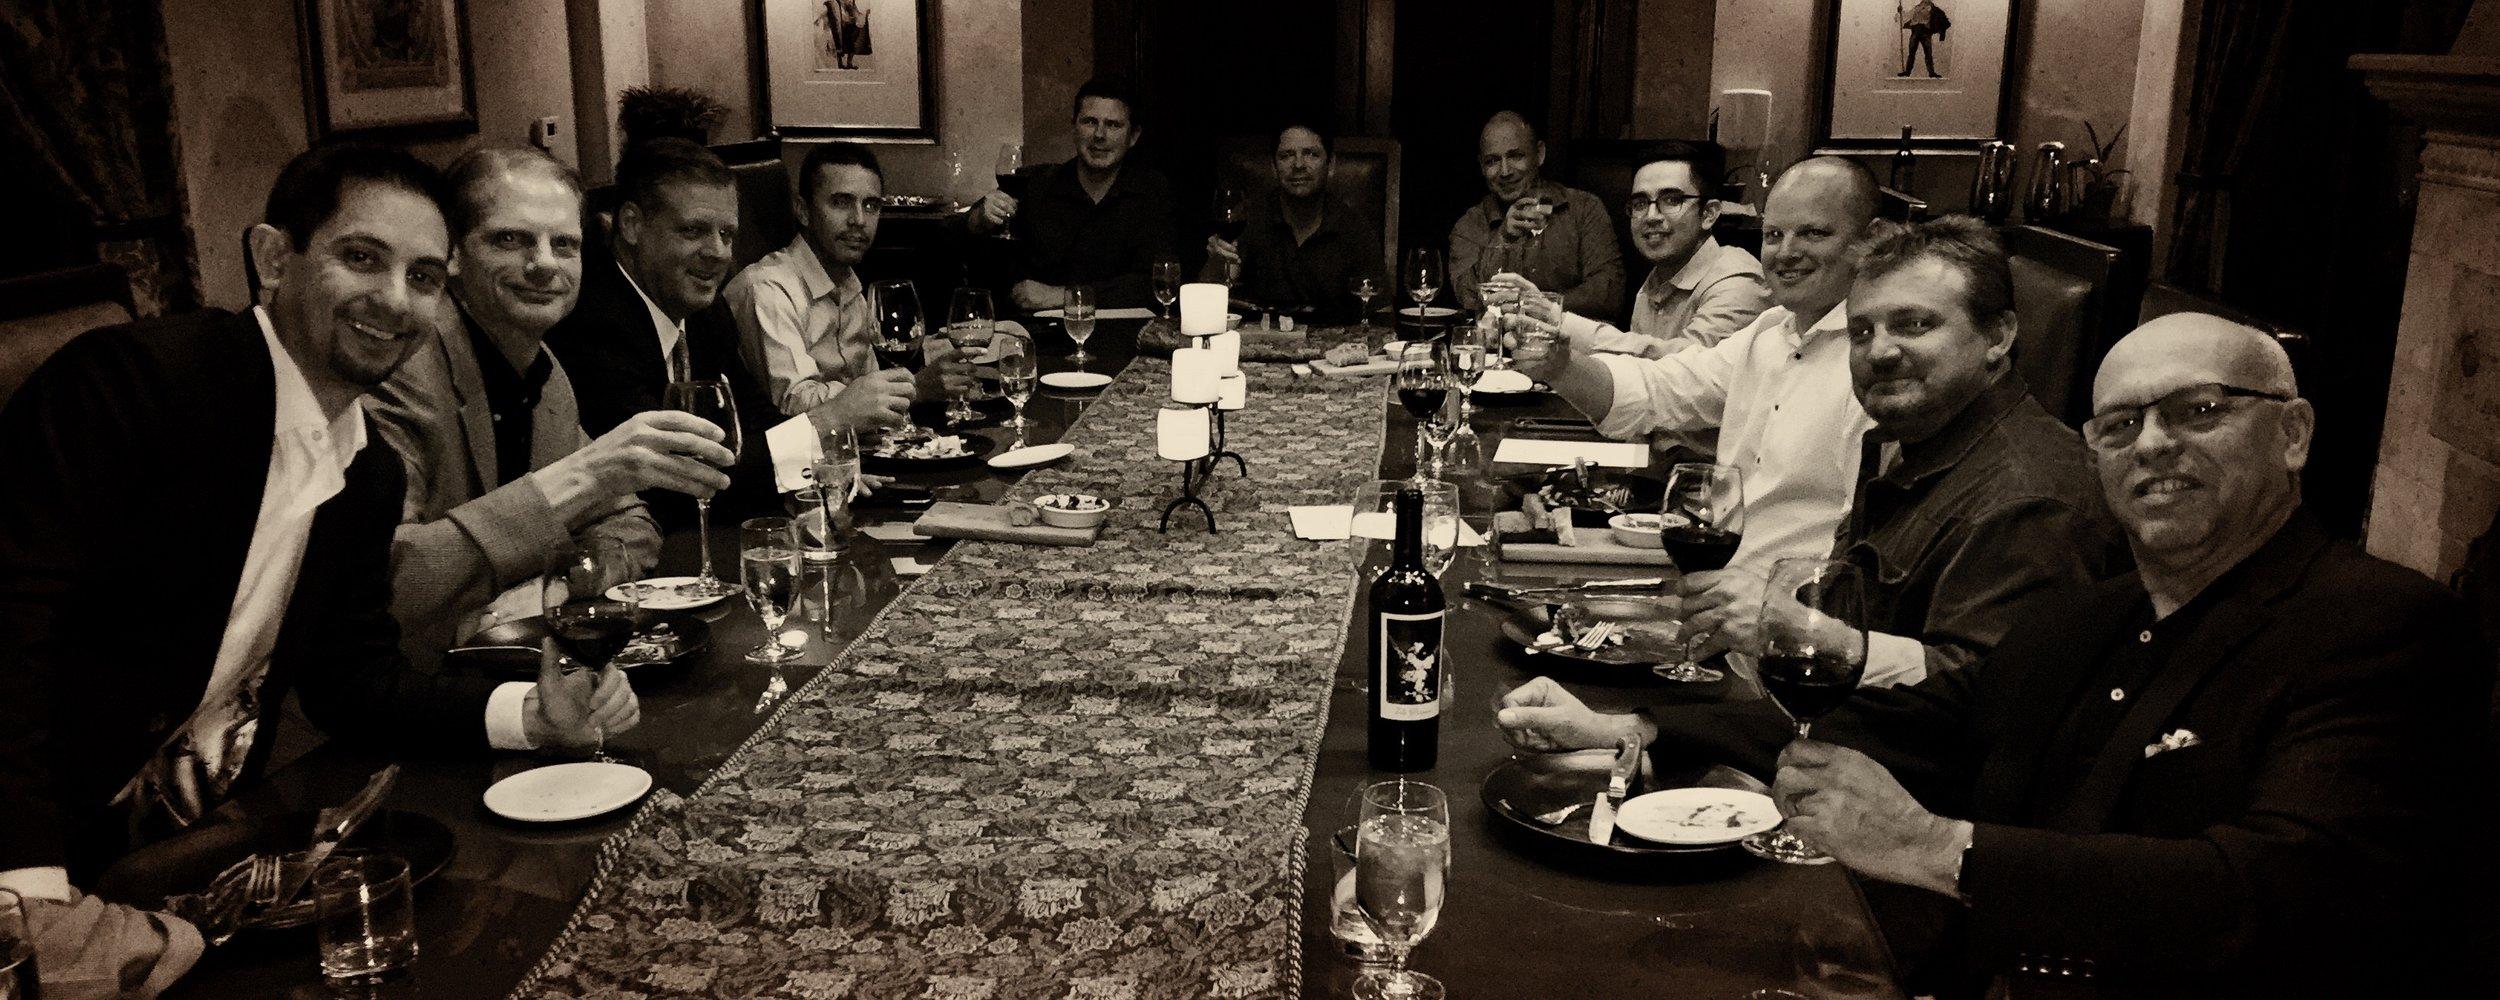 Tim's Bachelor dinner at The Royal Palms Hotel